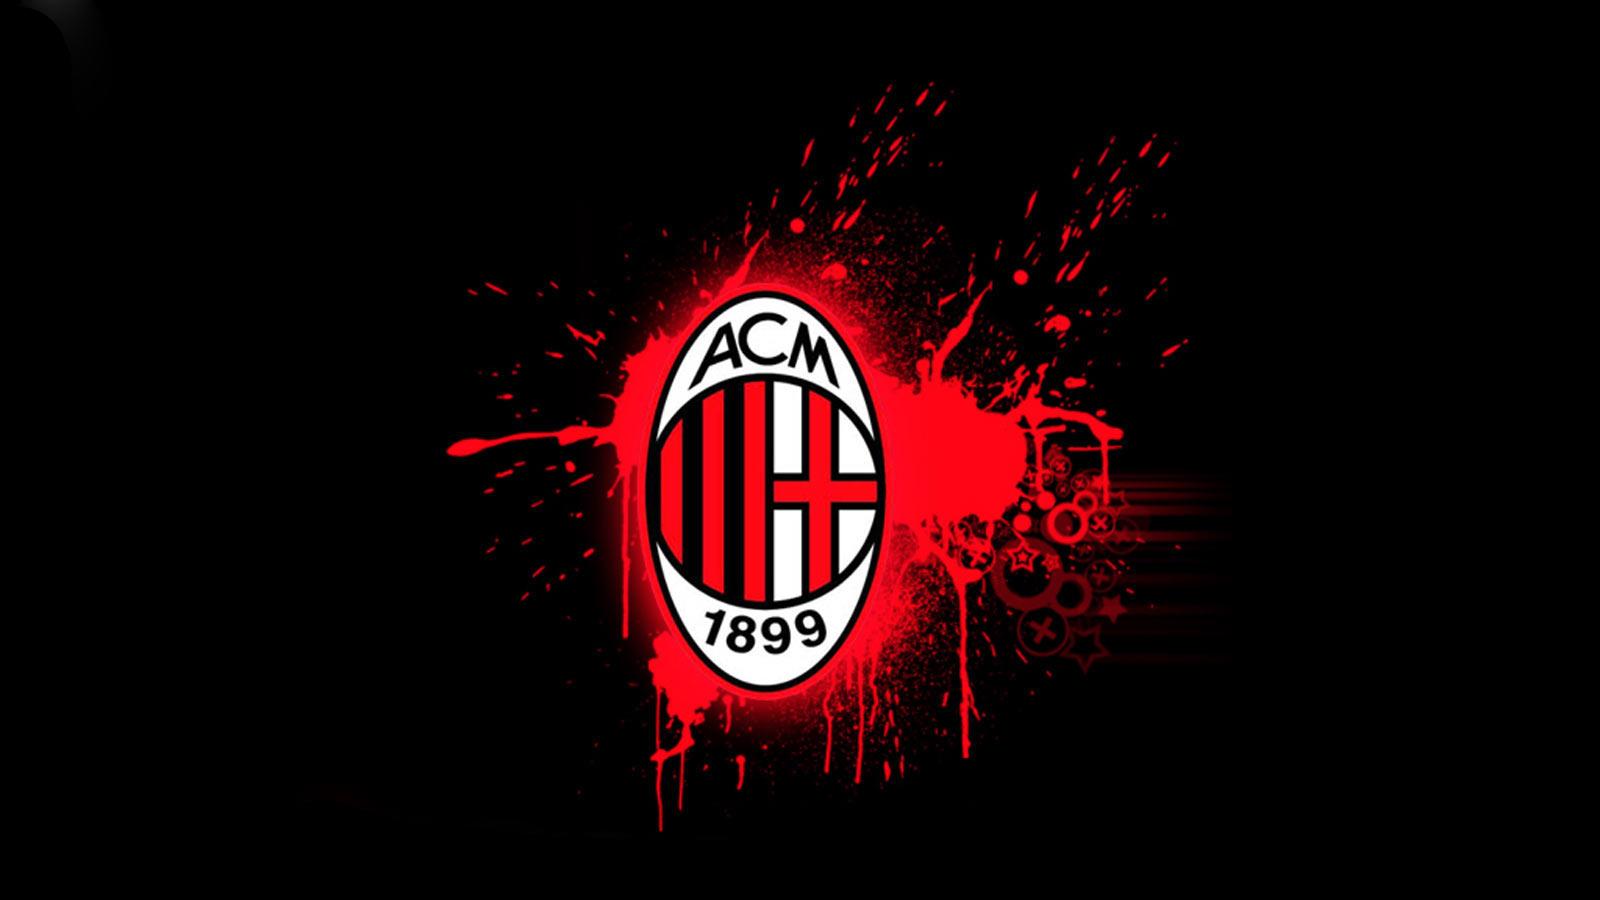 Wallpaper AC Milan Super Keren Gambar Foto Display Profile DP BBM